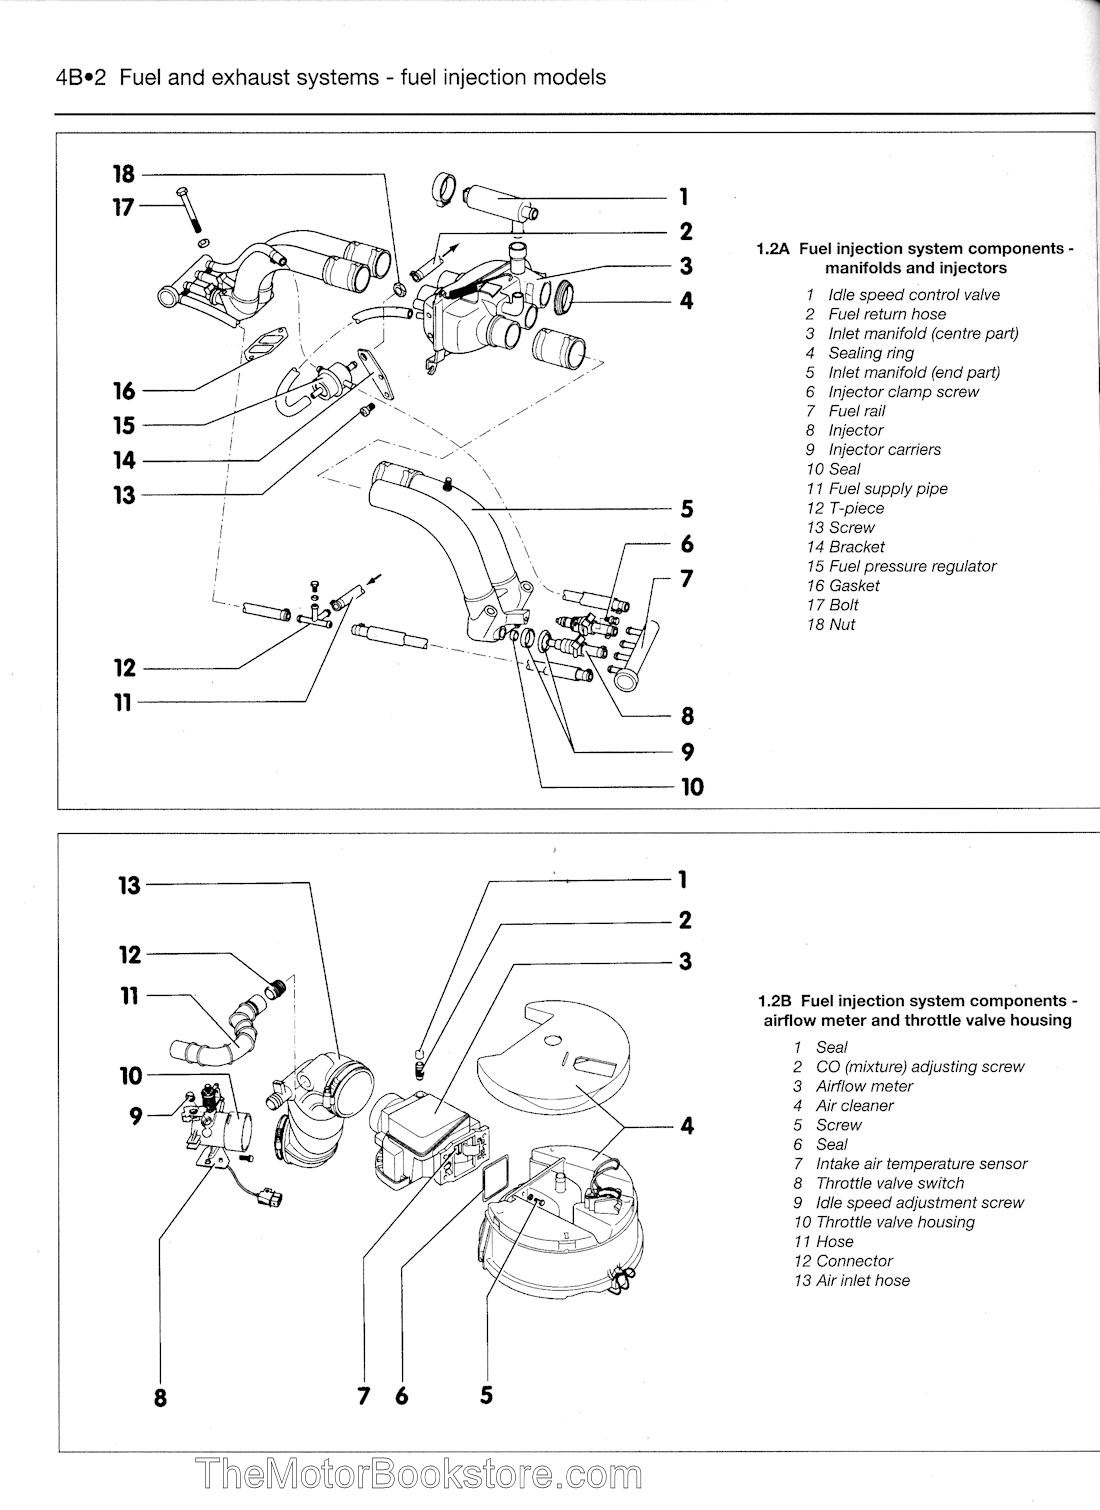 vw transporter repair manual haynes 3452 sample page?resize\=665%2C913\&ssl\=1 bmw n54 wiring diagram wiring diagram shrutiradio  at arjmand.co